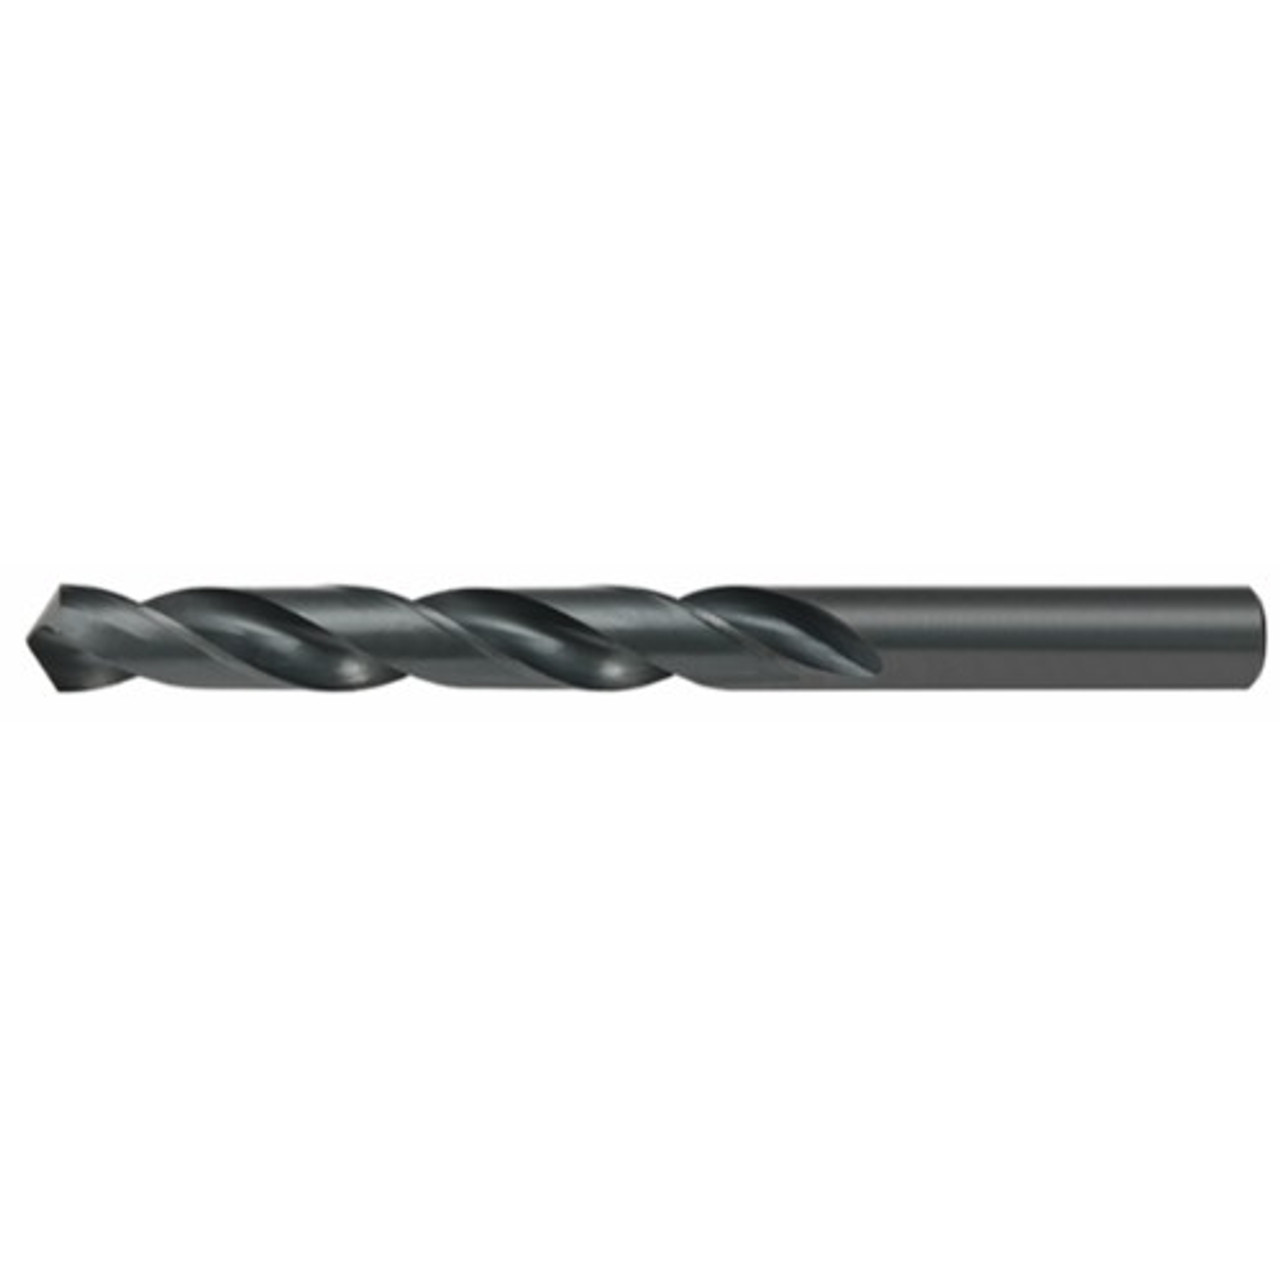 12 Pack Alfa Tools MJ251983 5.70mm High-Speed Steel Metric Black Oxide Finish Jobber Drill